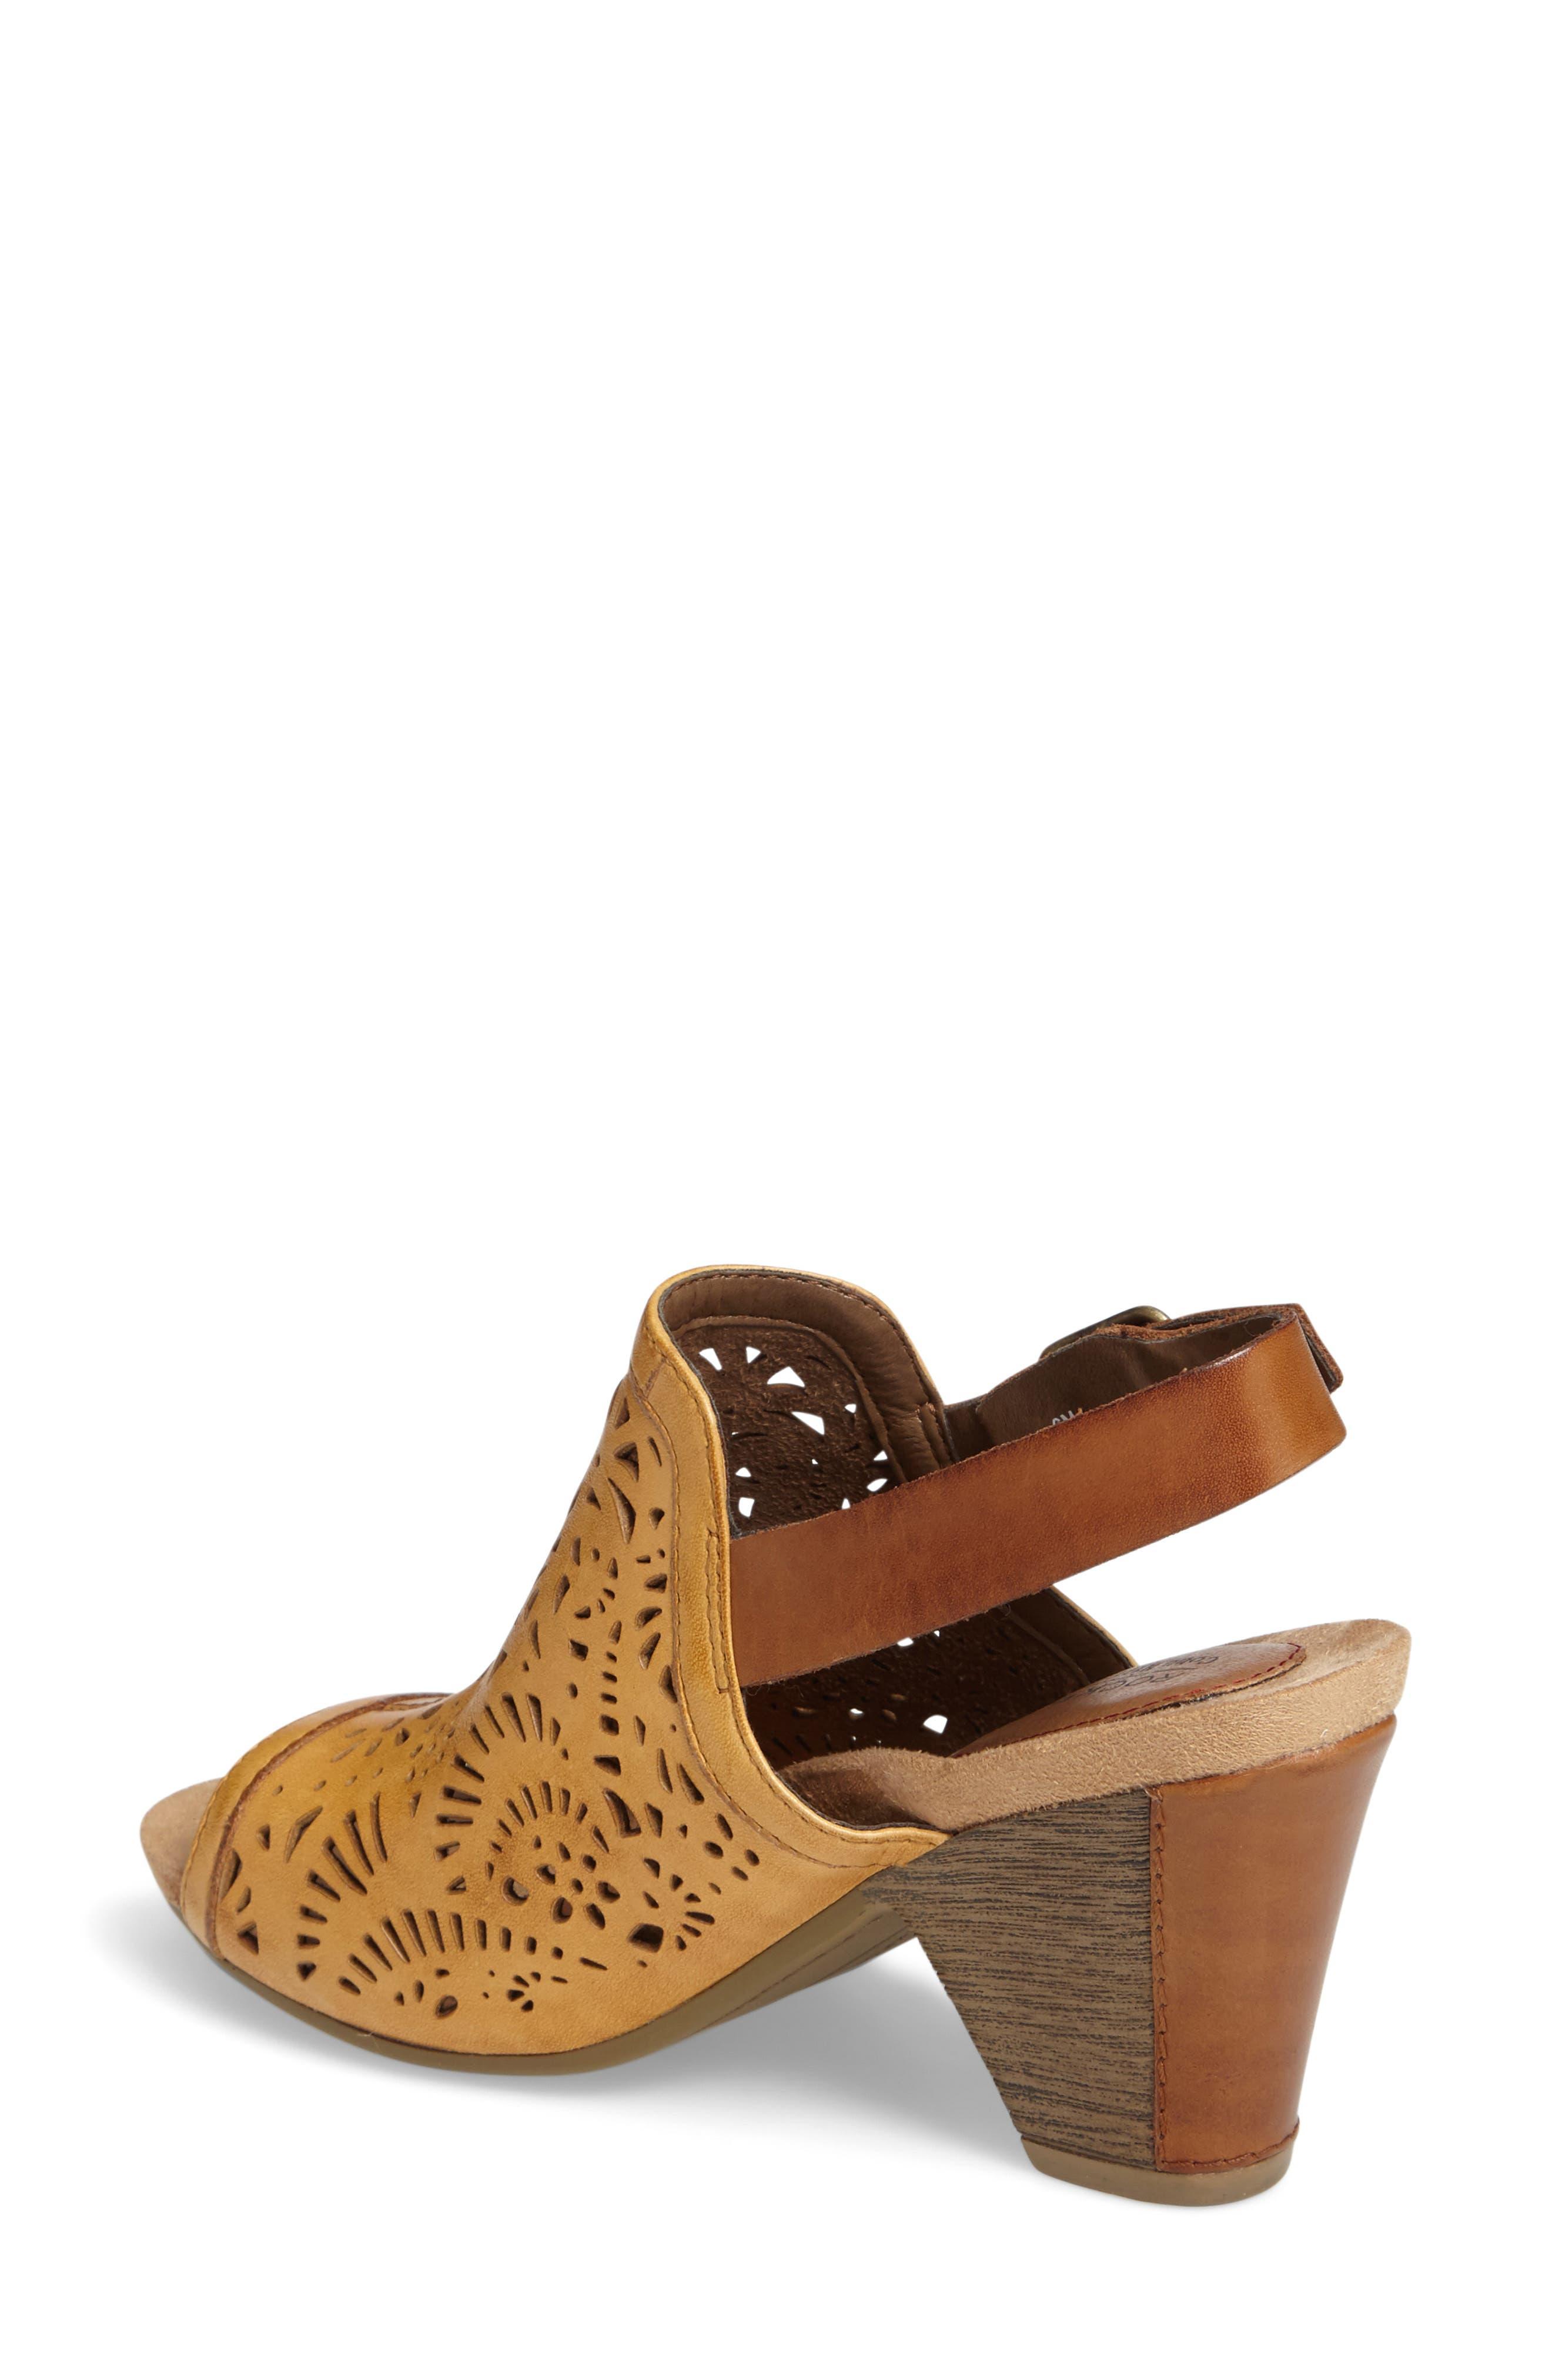 Tropez Block Heel Sandal,                             Alternate thumbnail 6, color,